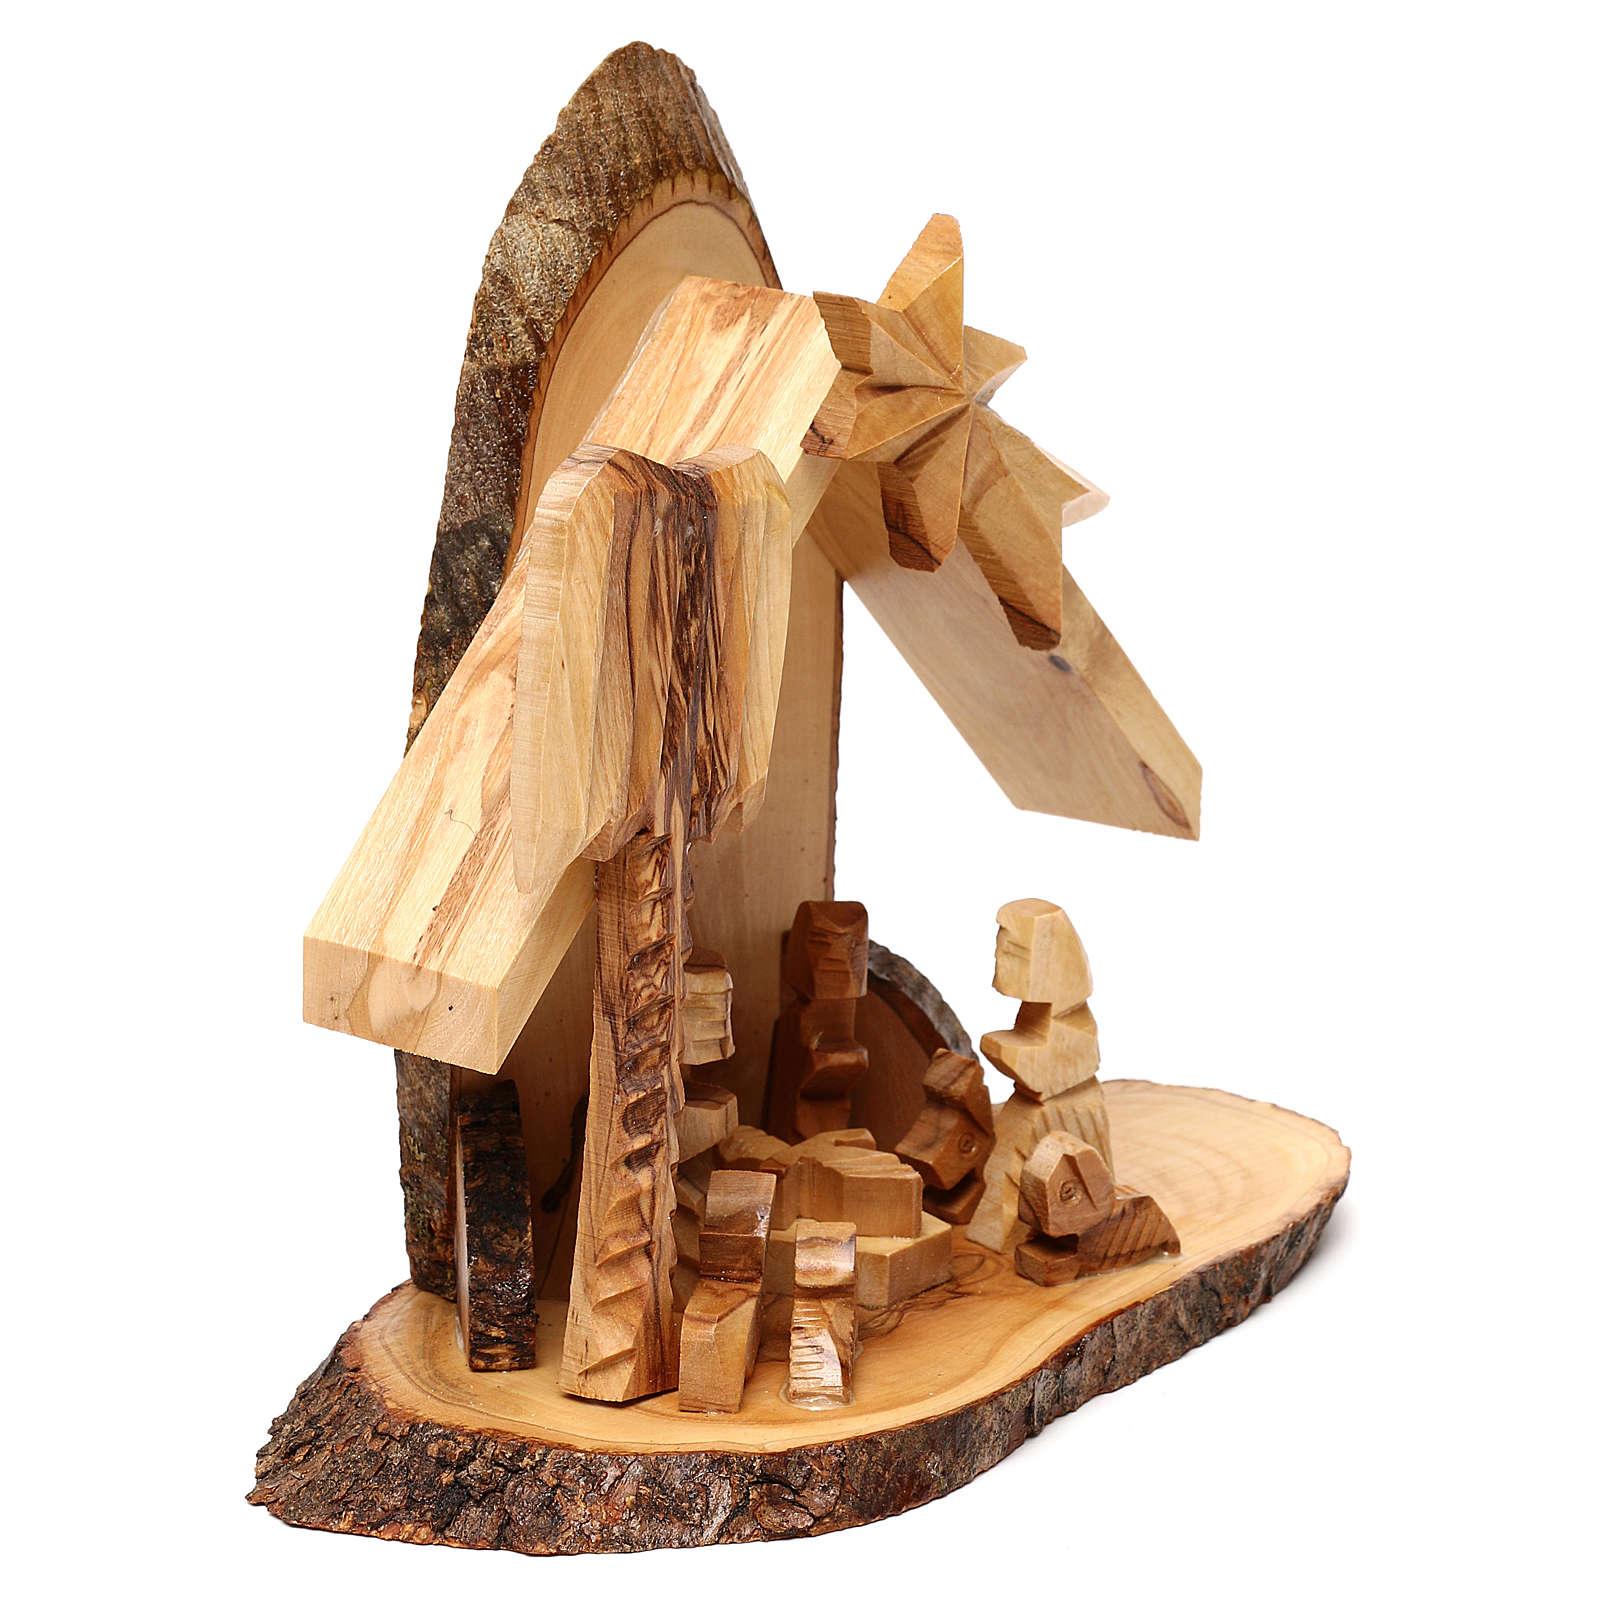 Nativity scene with cave in Bethlehem olive wood, stylized 20x20x10 cm 4